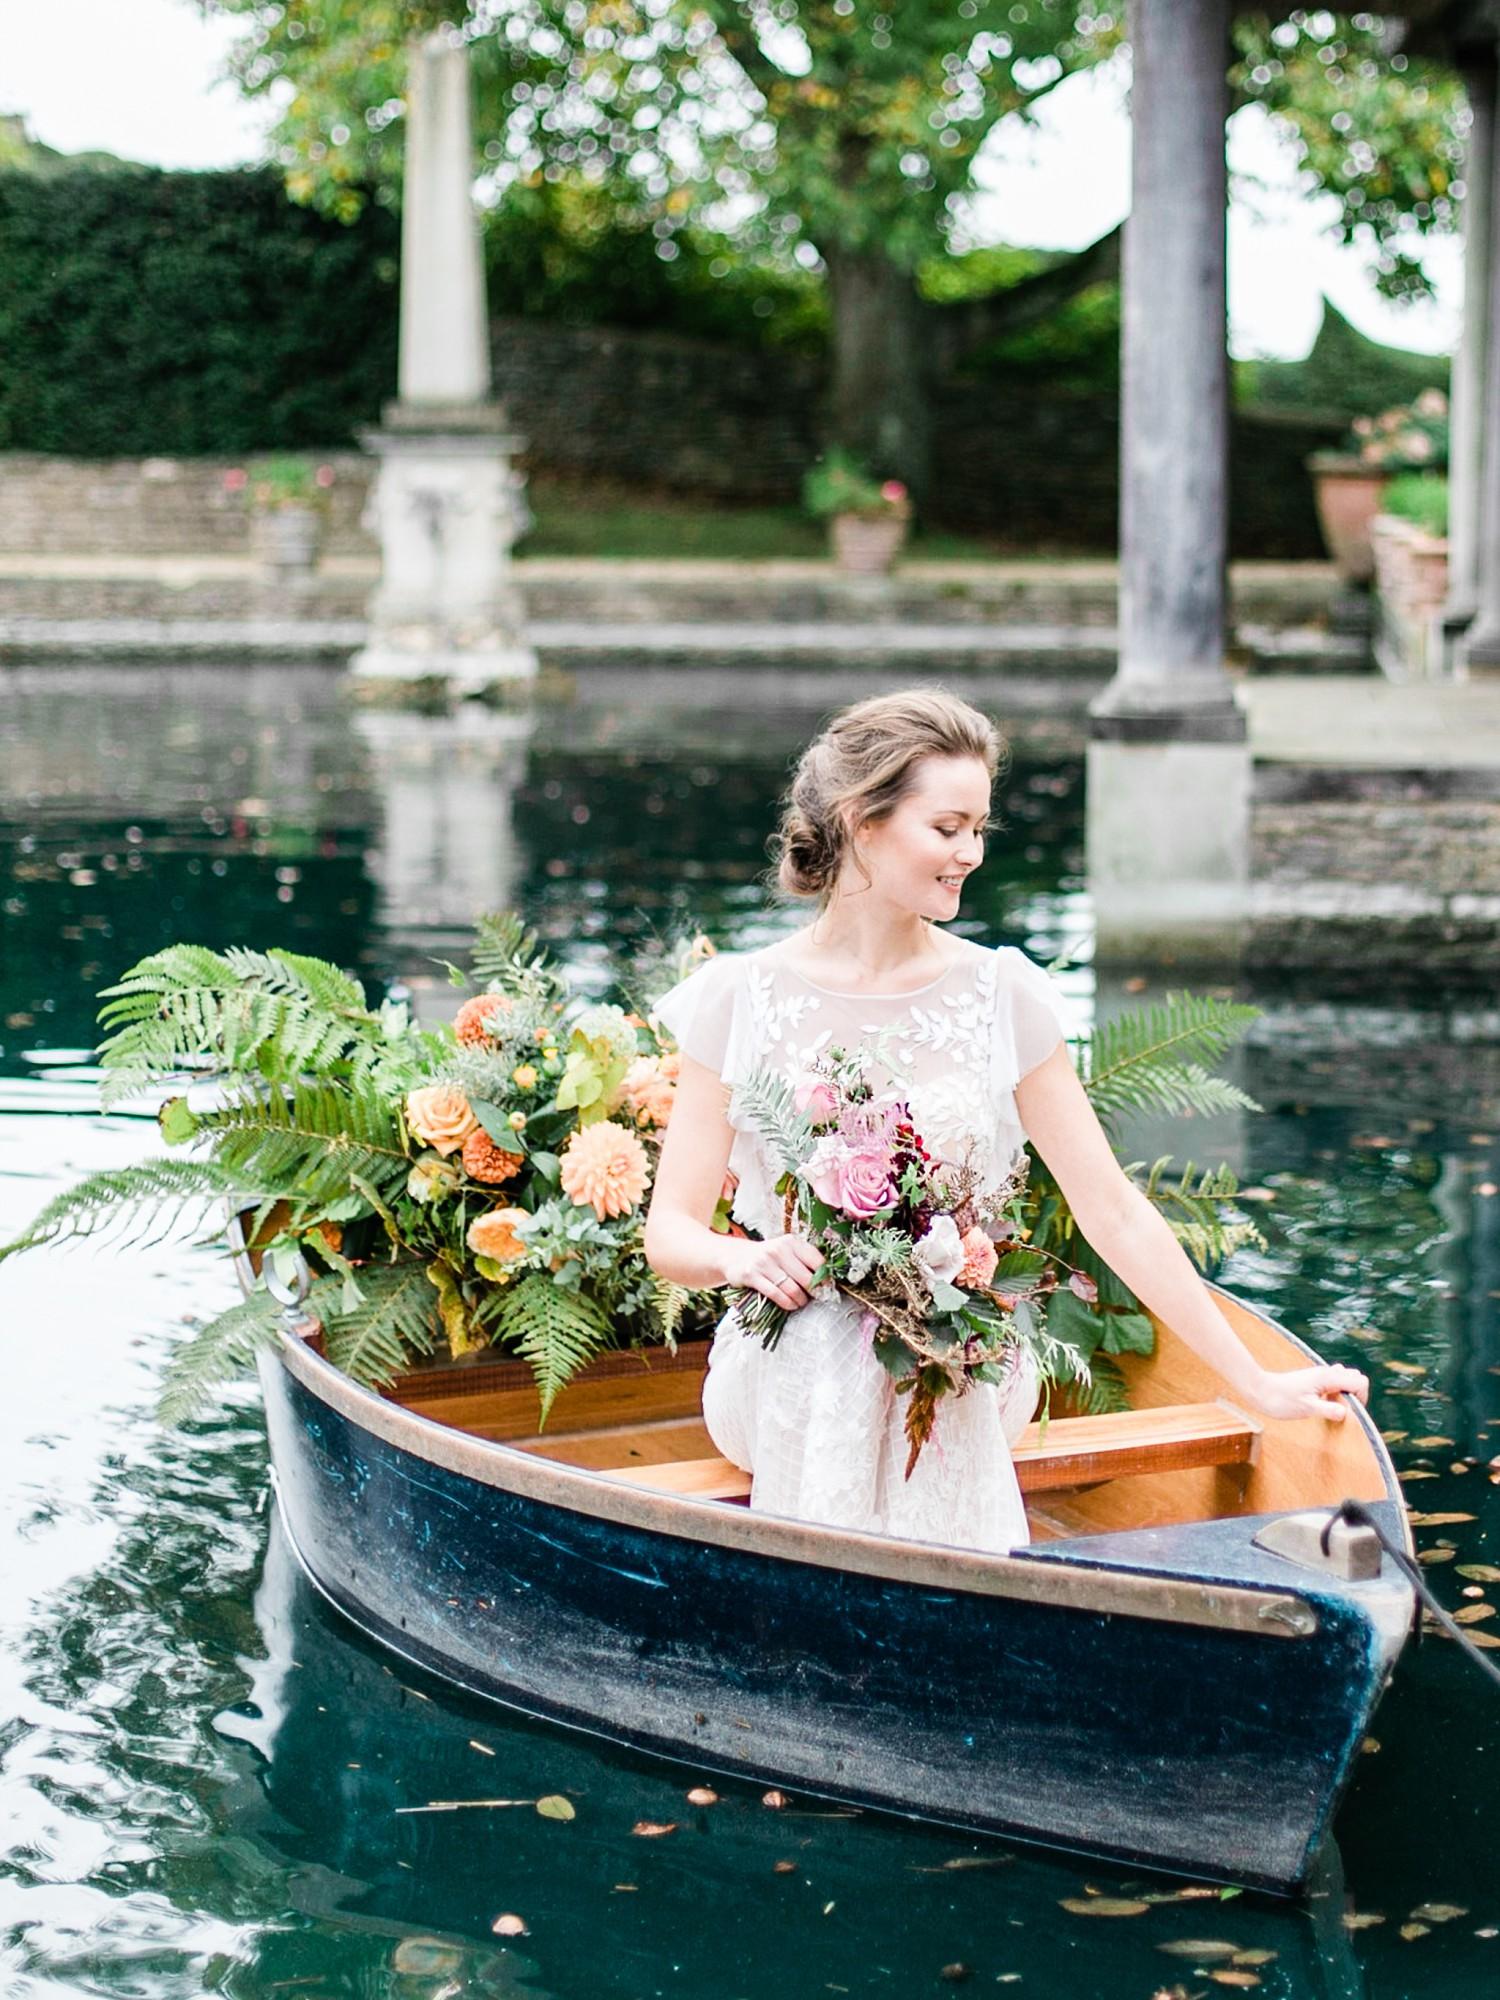 Cotswolds Weddings,Sandon Hall Wedding,Staffordshire Wedding Photographer,The Lost Orangery,Weddings at the lost orangery,fine art wedding photographer,